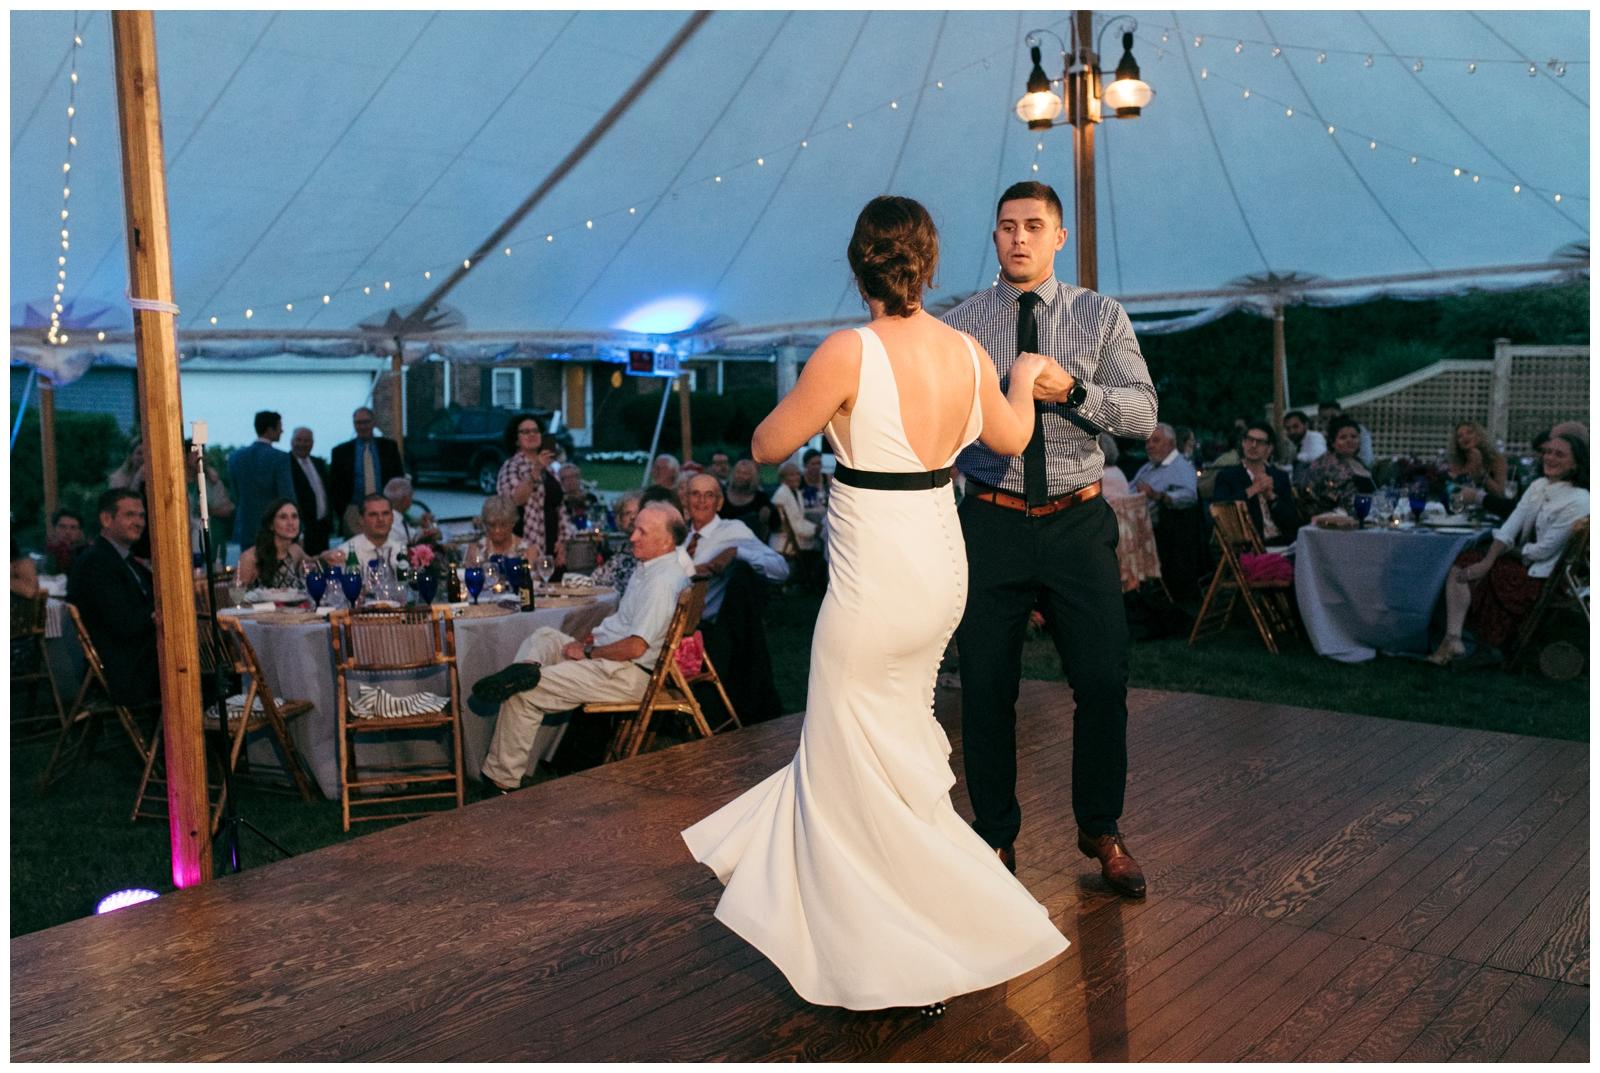 Bailey-Q-Photo-Backyard-Wedding-South-Shore-Boston-Wedding-Photographer-112.jpg